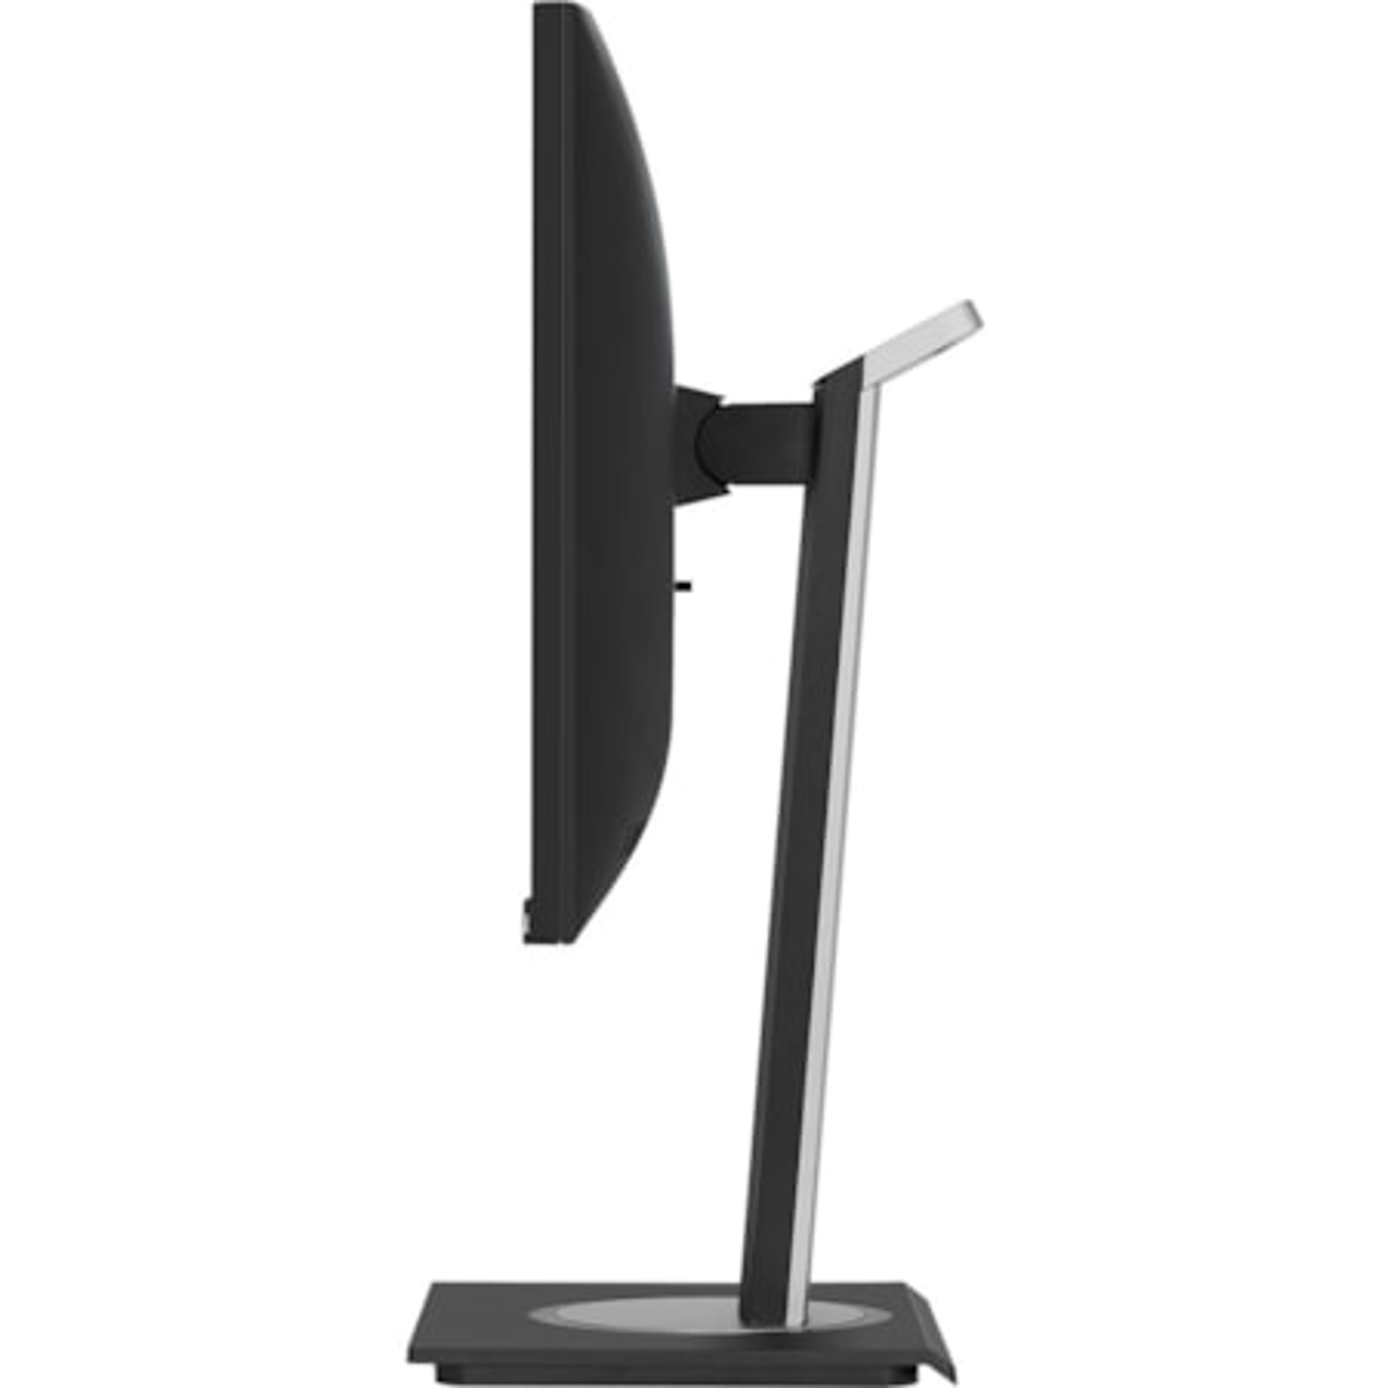 "Viewsonic VG2755-2K 68.6 cm (27"") WQHD WLED LCD Monitor - 16:9"